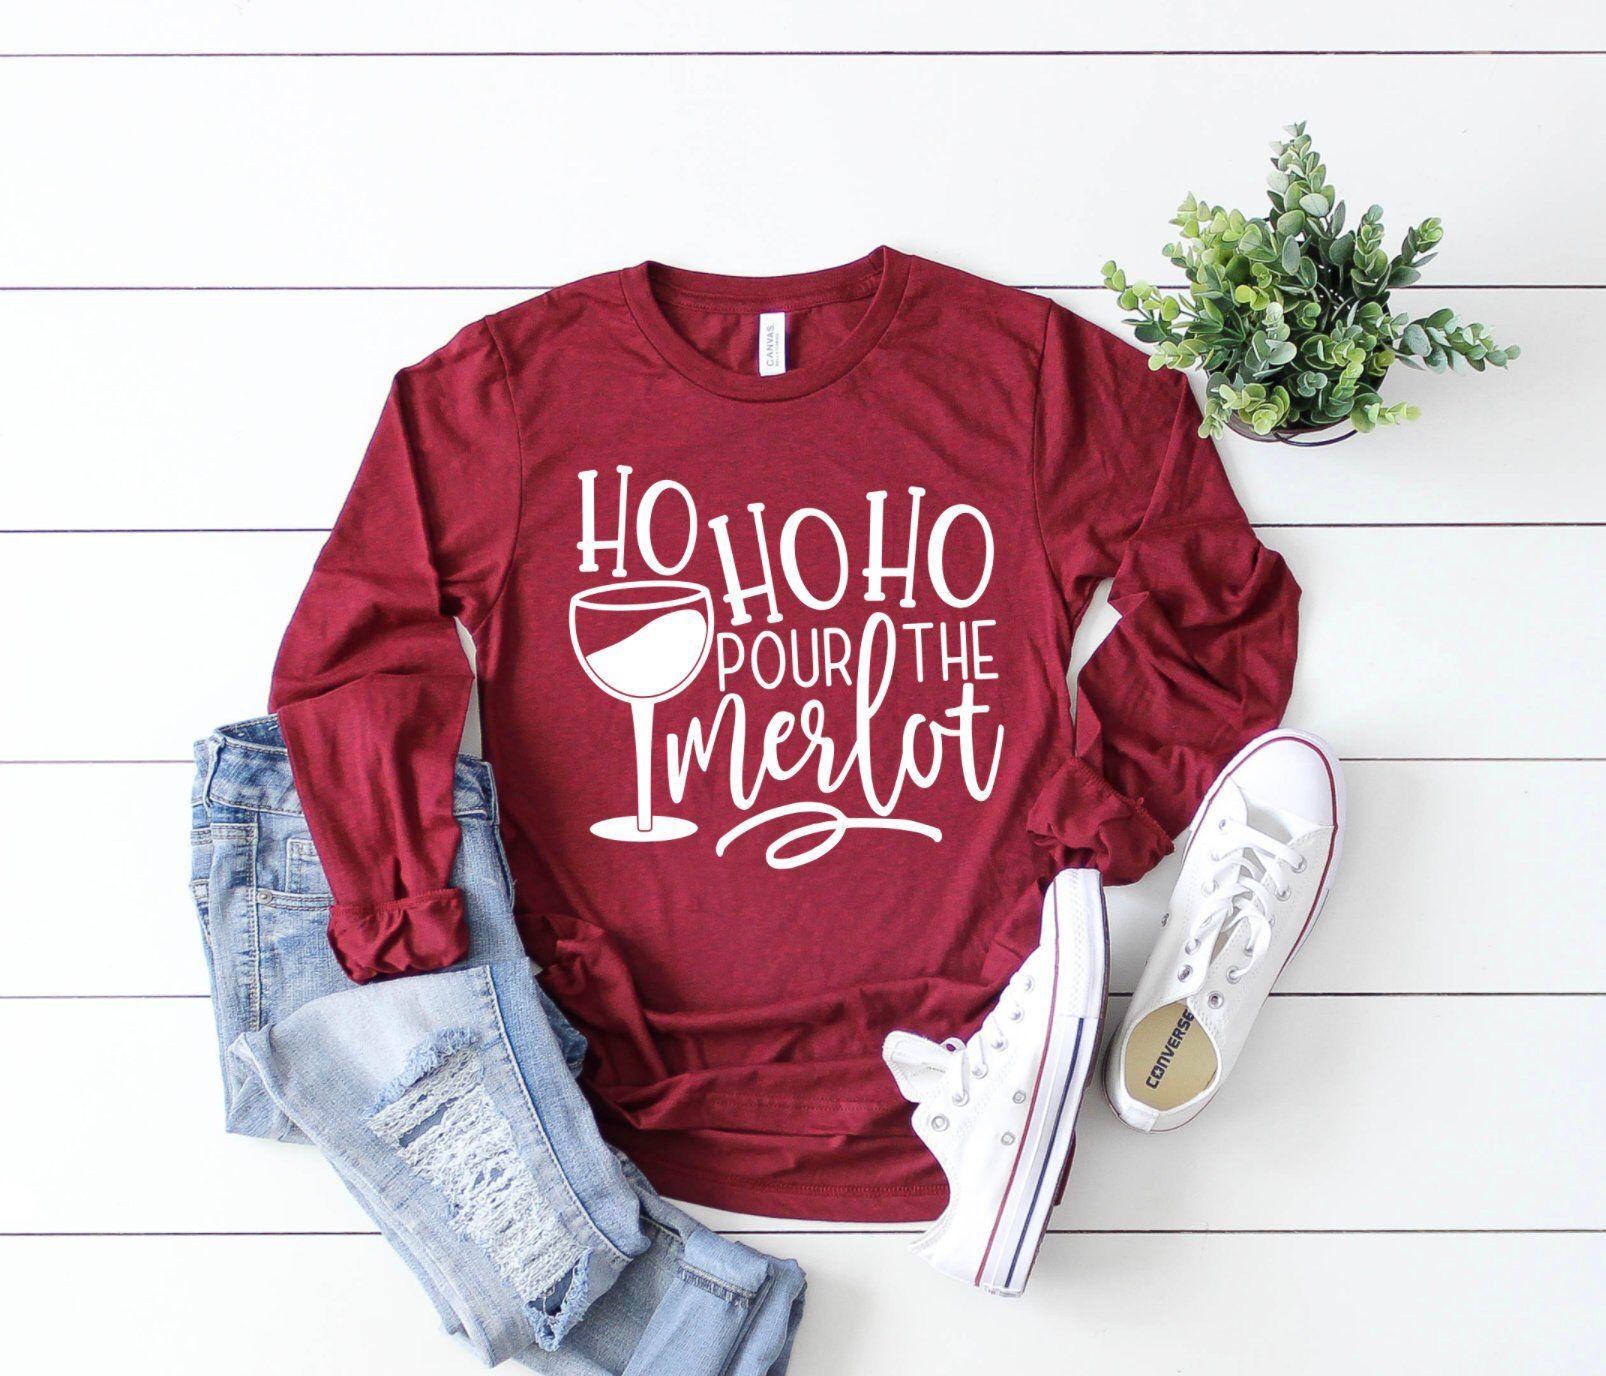 c2338d25 Christmas Long Sleeve Shirt, Christmas Shirts, Christmas Shirts for Women, Holiday  Shirts, Long Sleeve Christmas Shirts for Women, Ho Ho Ho pour the merlot,  ...